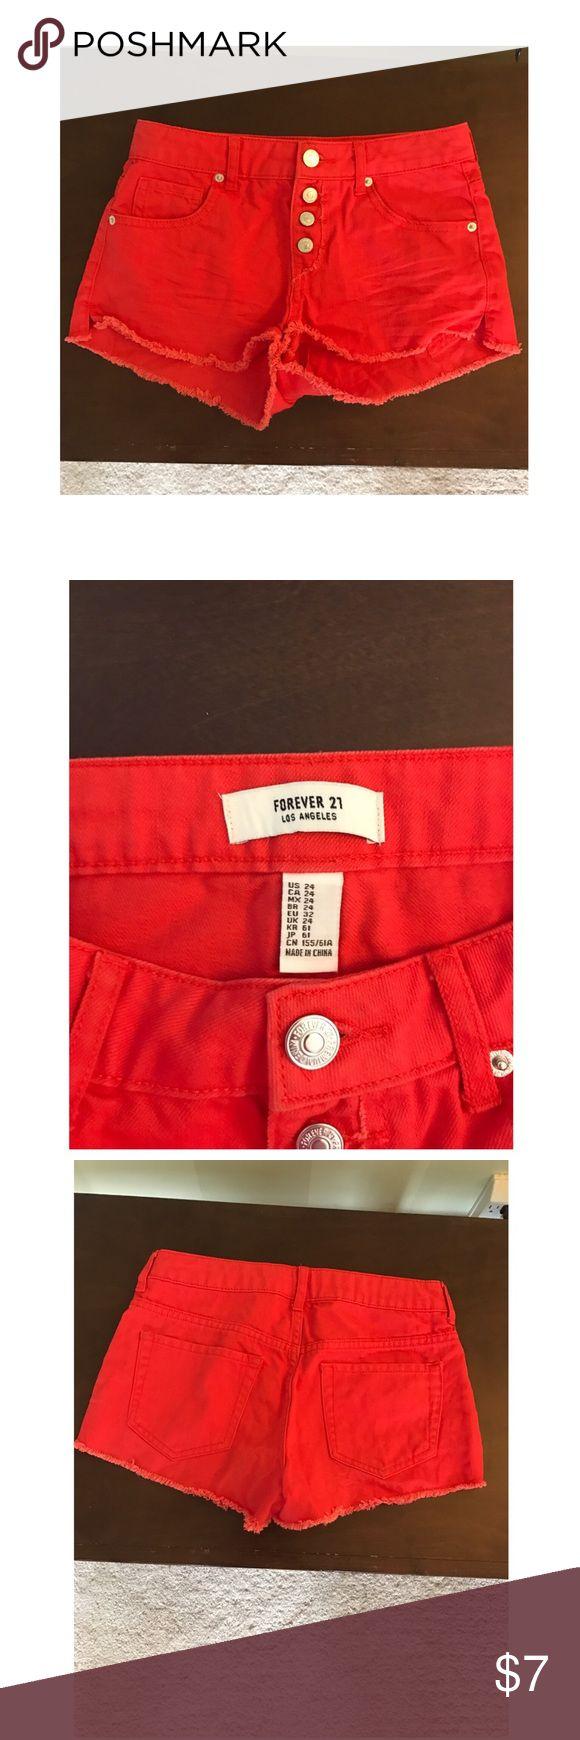 Forever 21 shorts Forever 21 red shorts size 24 Forever 21 Shorts